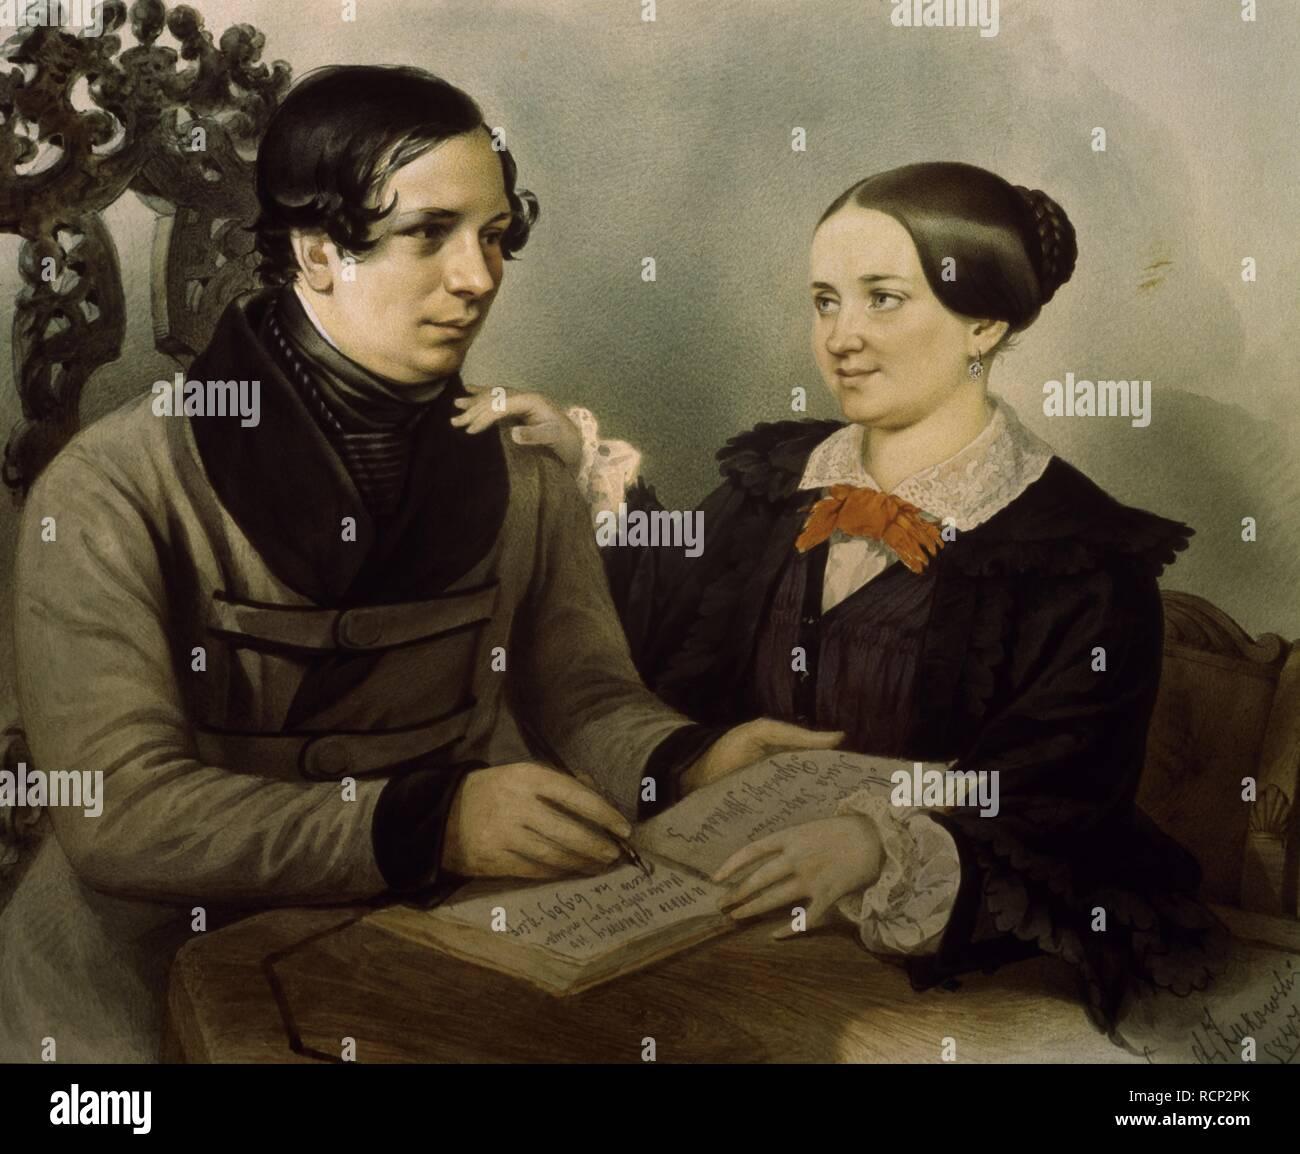 Portrait of the author Nestor Kukolnik (1809-1868) with his wife. Museum: State Russian Museum, St. Petersburg. Author: Zhukovsky, Rudolf Kasimirovich. - Stock Image